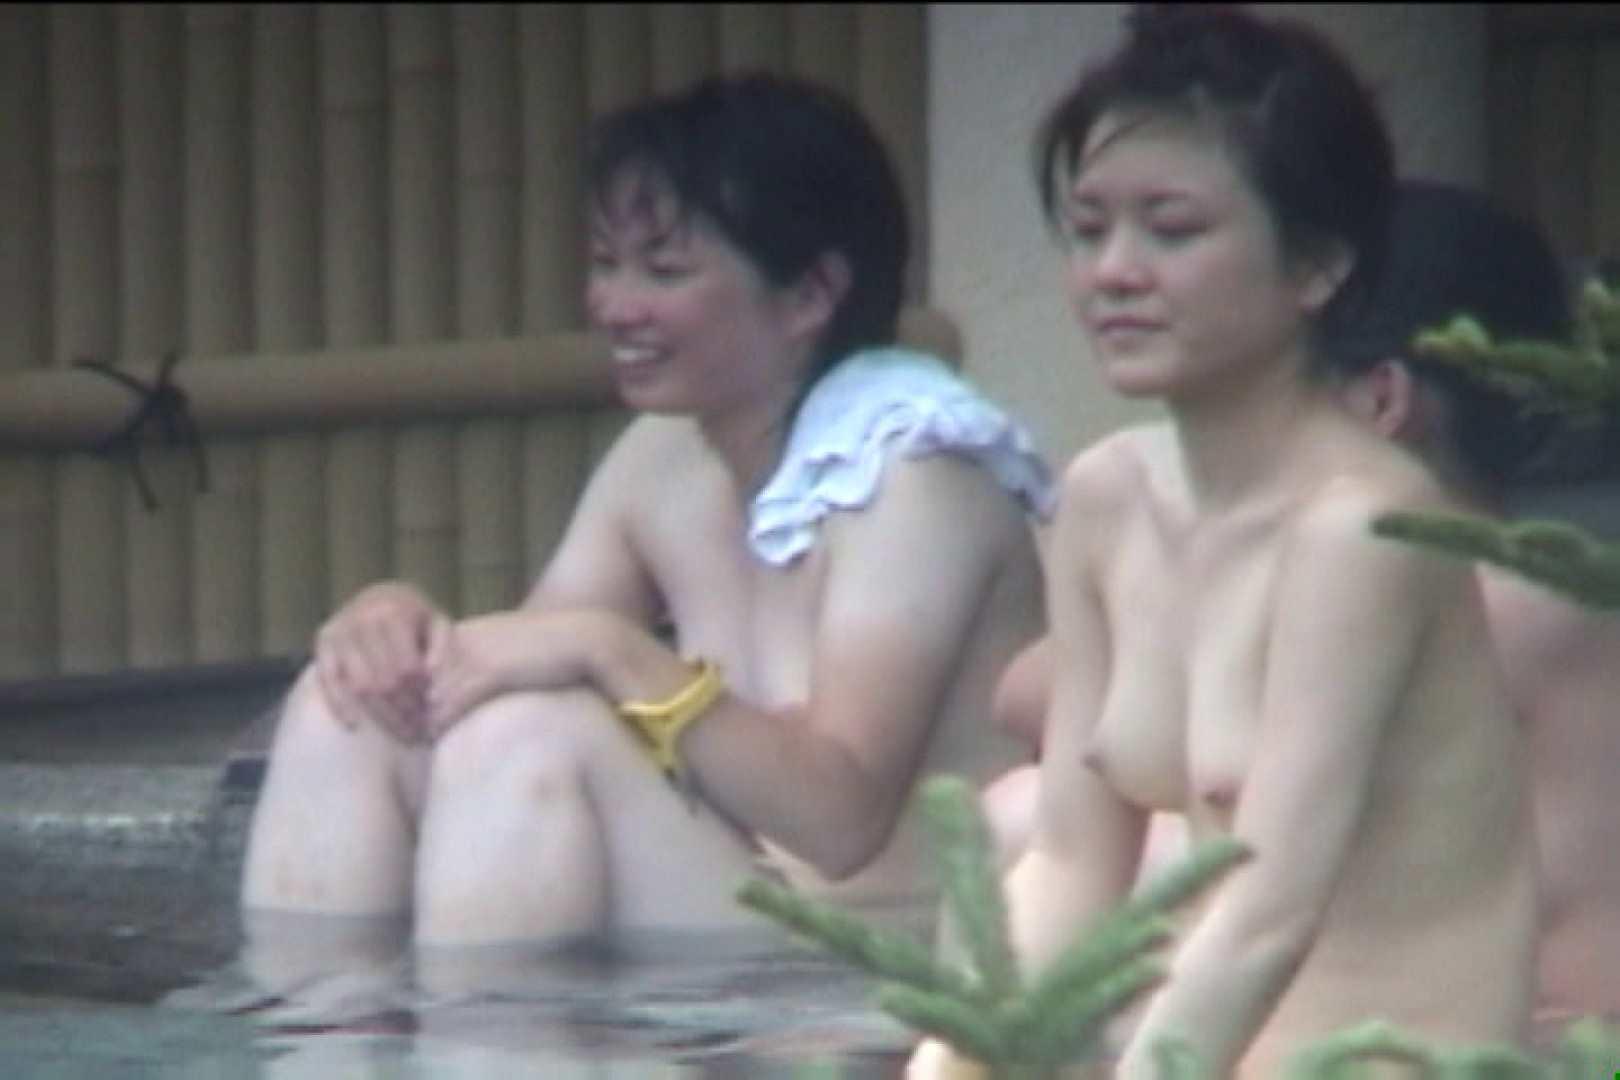 Aquaな露天風呂Vol.94【VIP限定】 盗撮シリーズ | 露天風呂編  111PIX 1